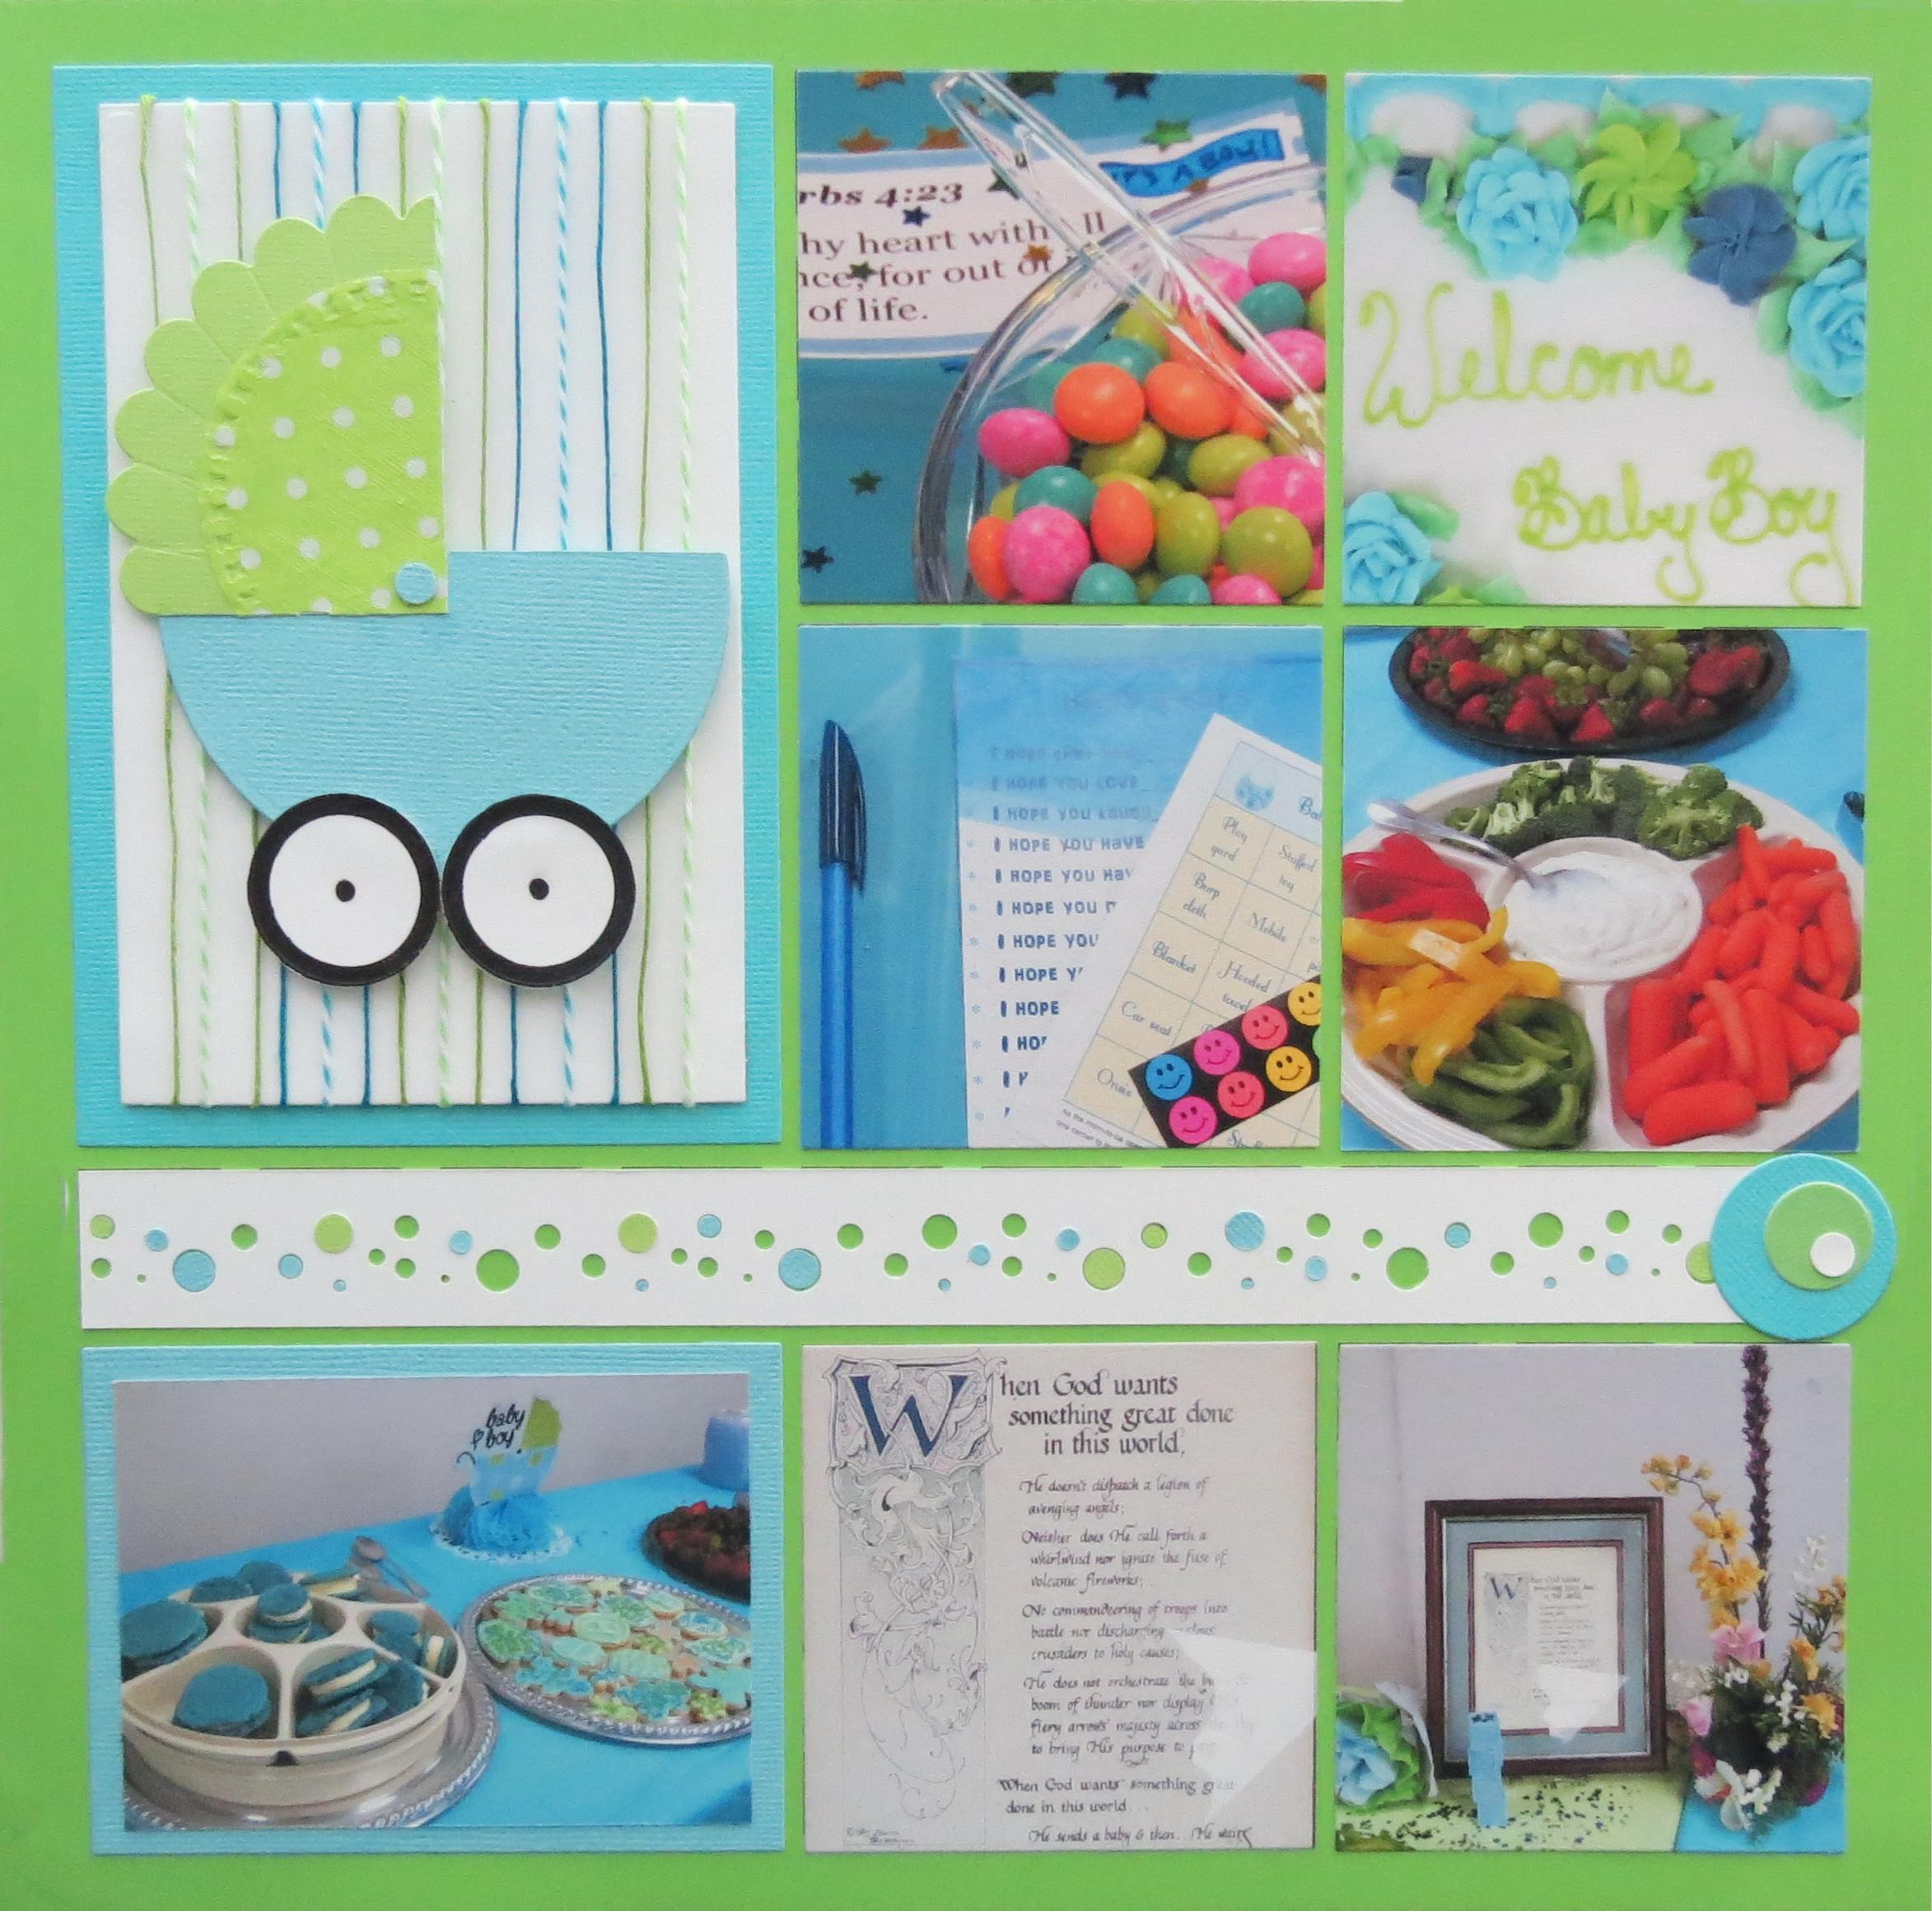 Summer vacation scrapbook ideas - Baby Shower Scrapbook Ideas Page 2